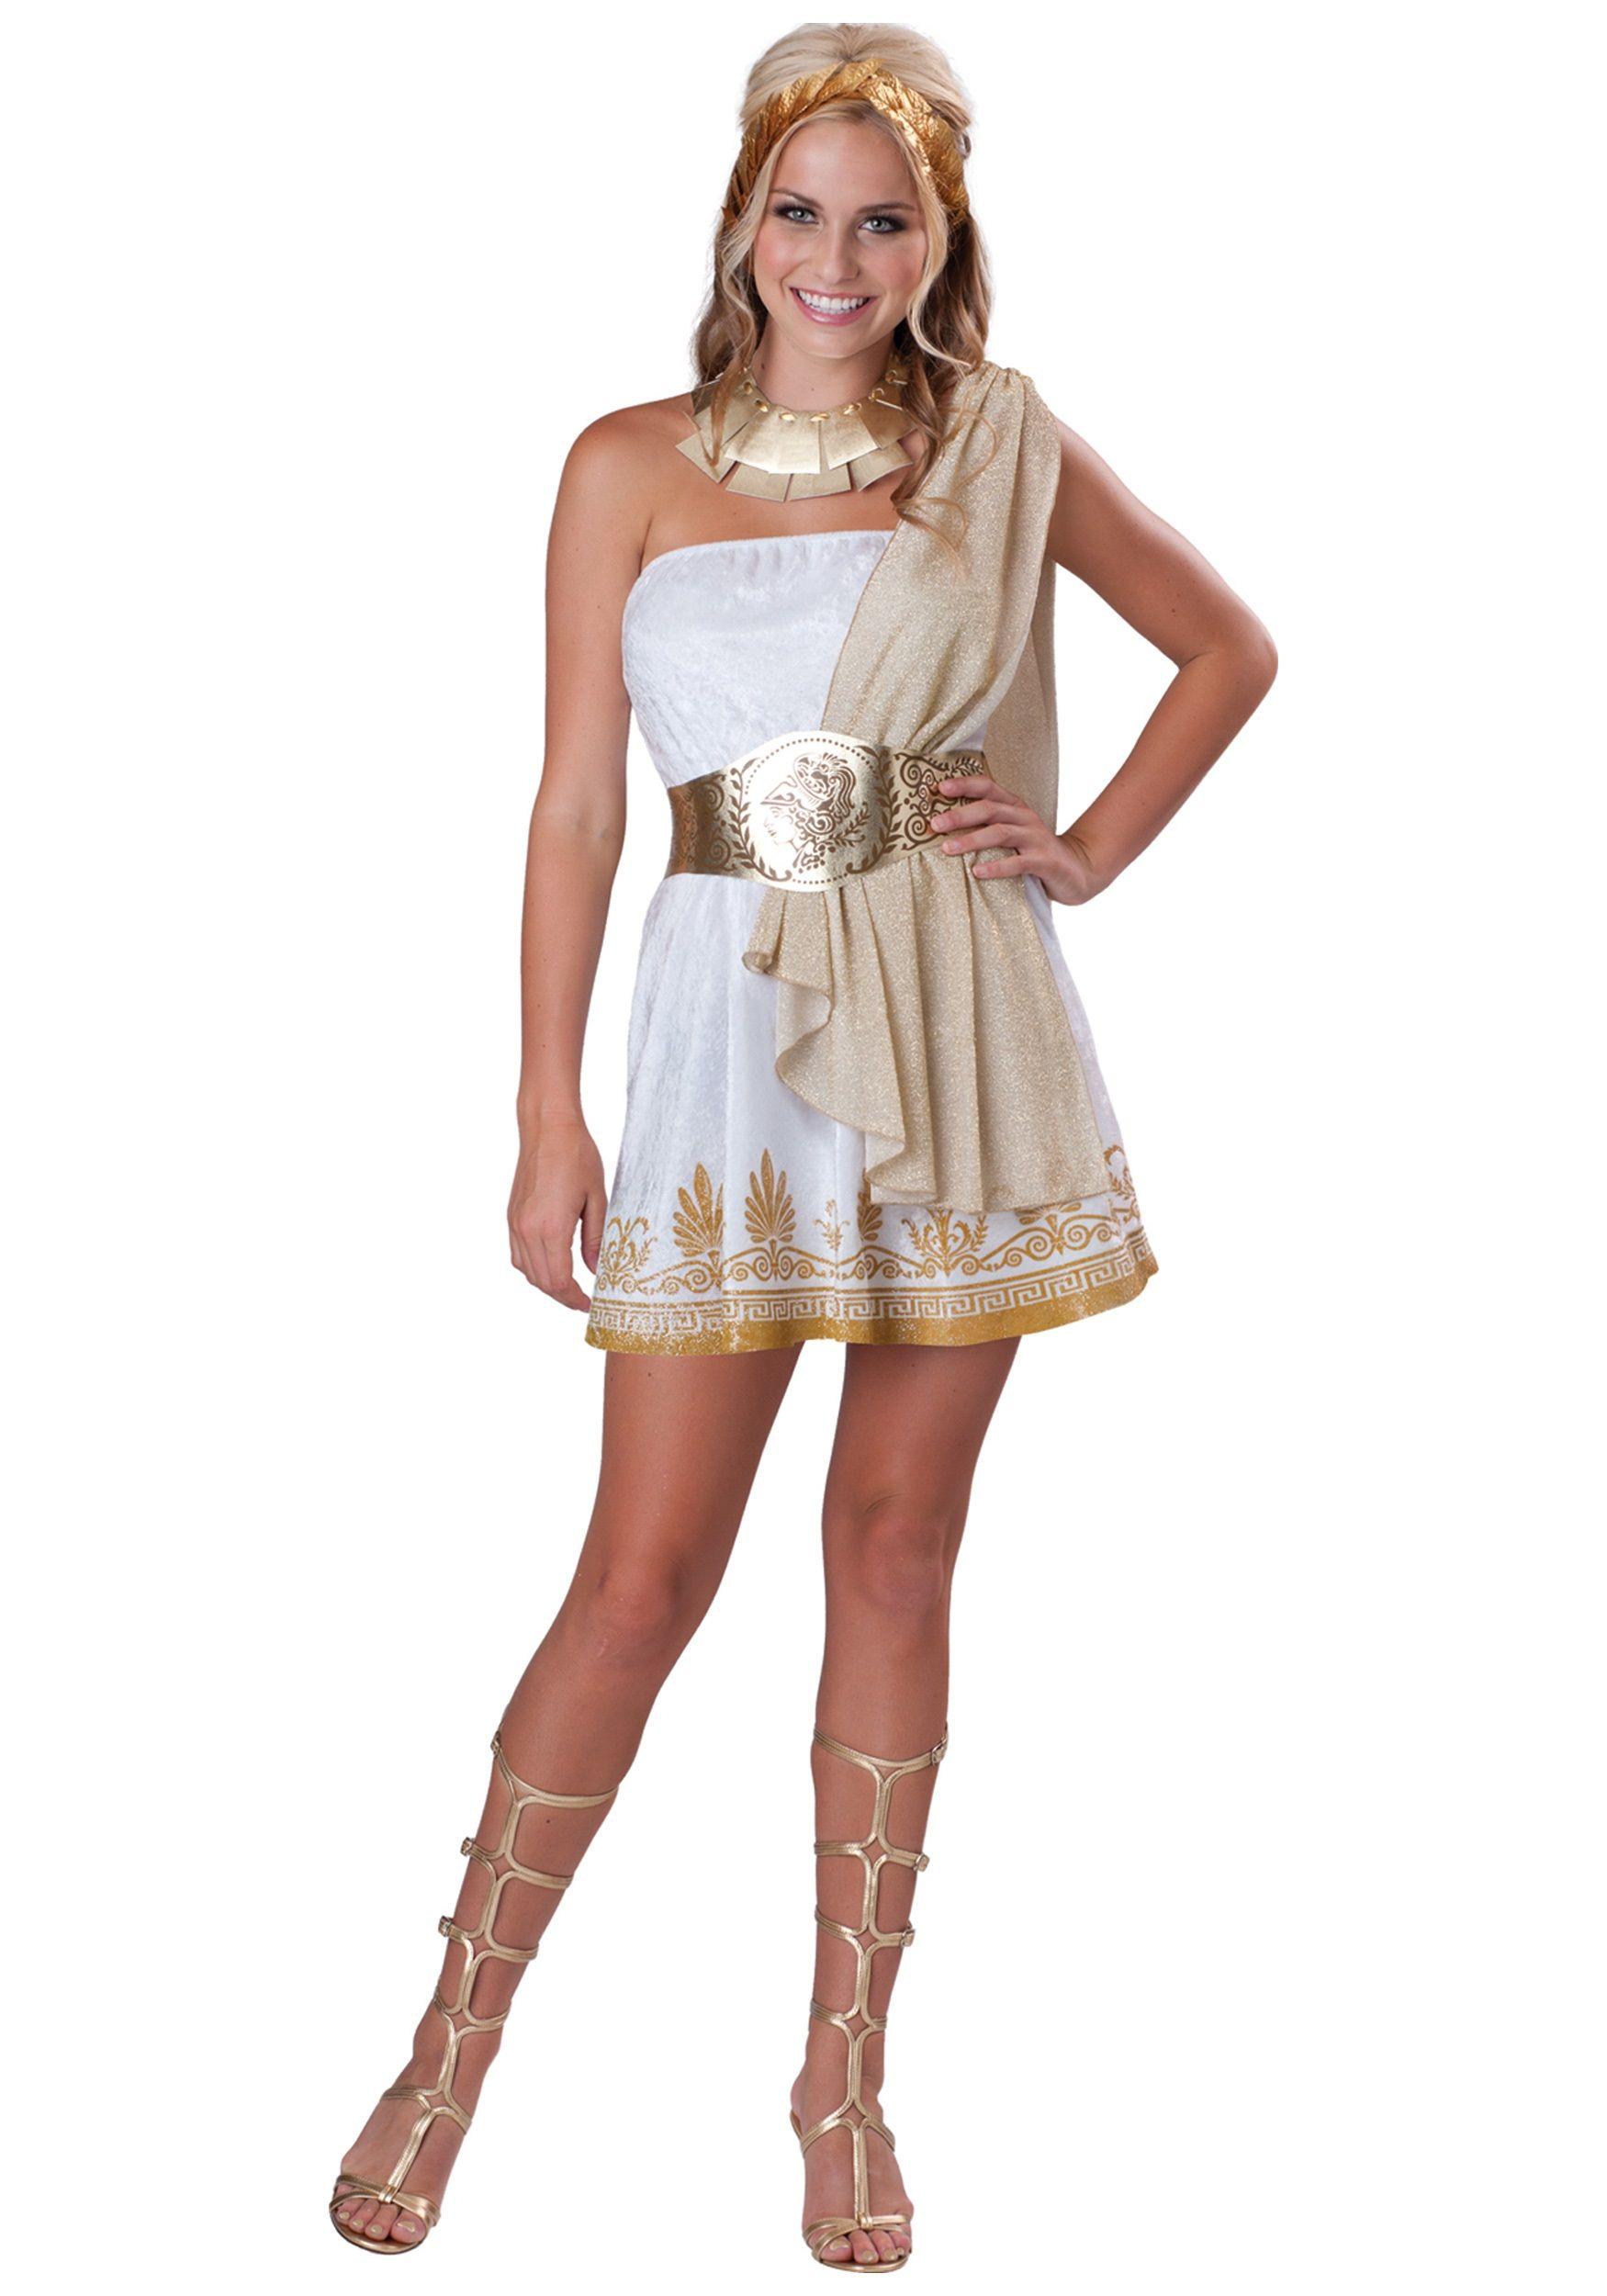 Artemis Greek Goddess Costume Ideas - Bing Images